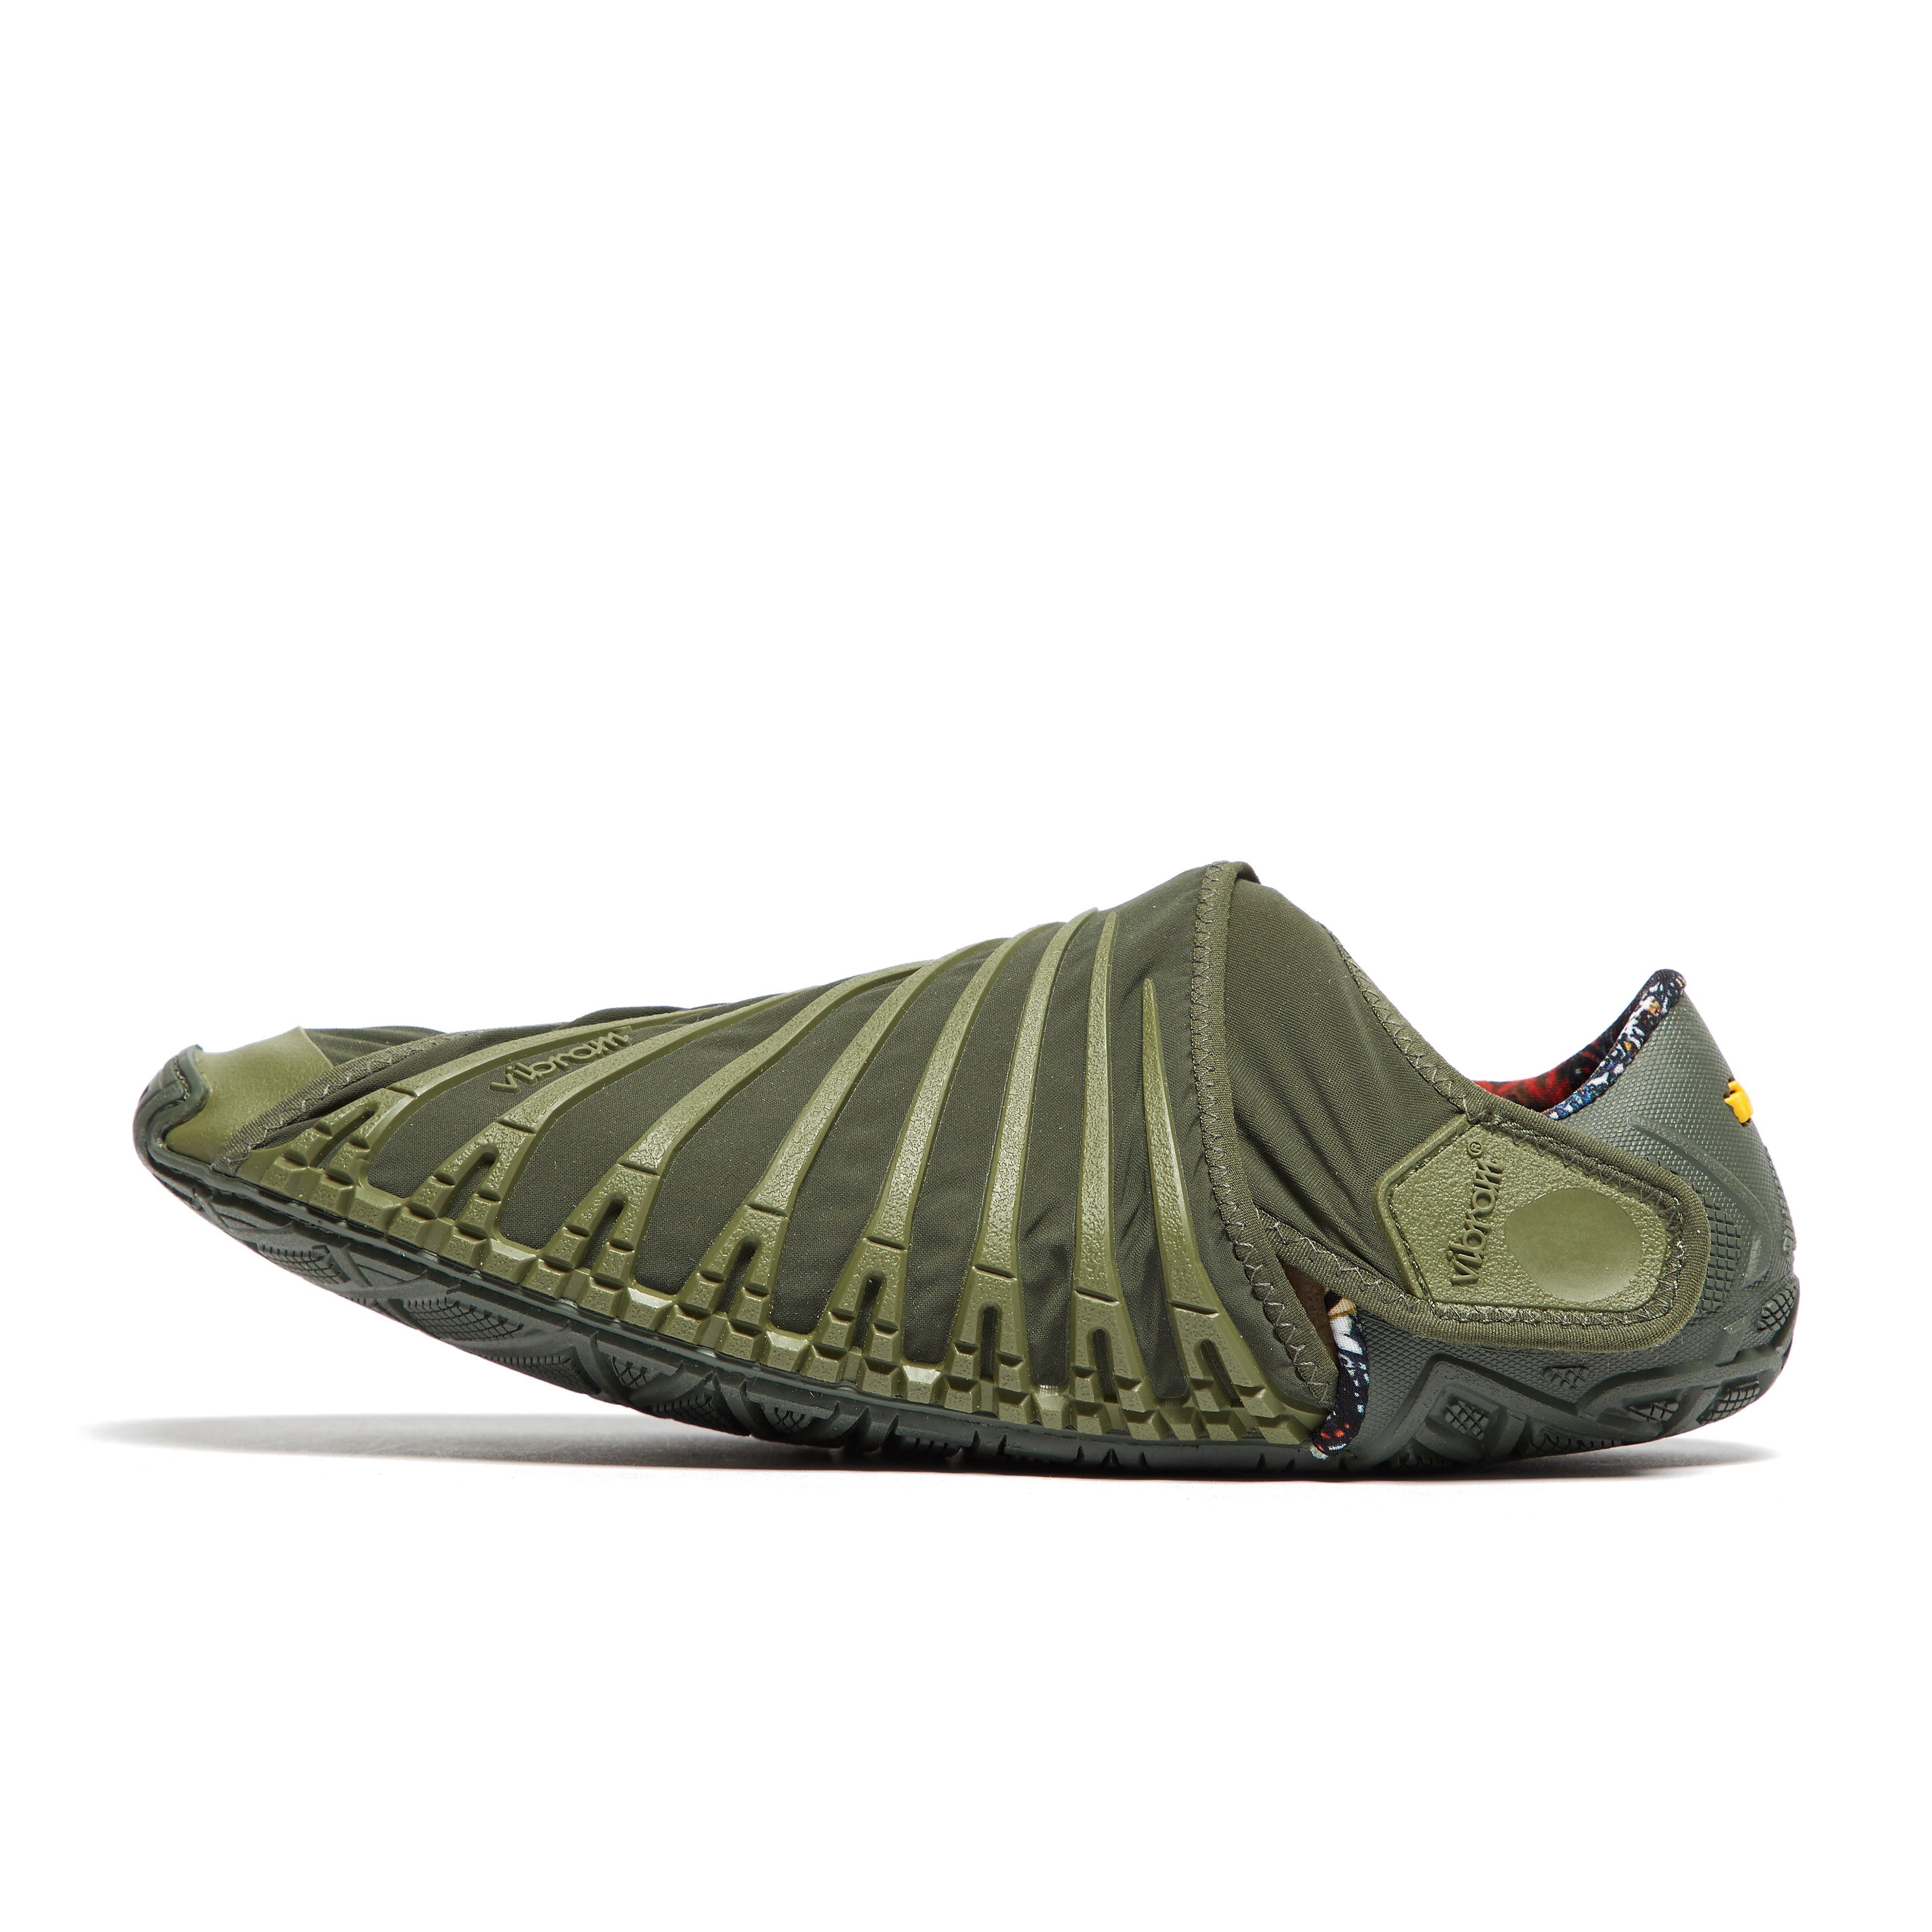 Vibram Five Fingers Furoshiki 2018 Original Men's Walking Shoes